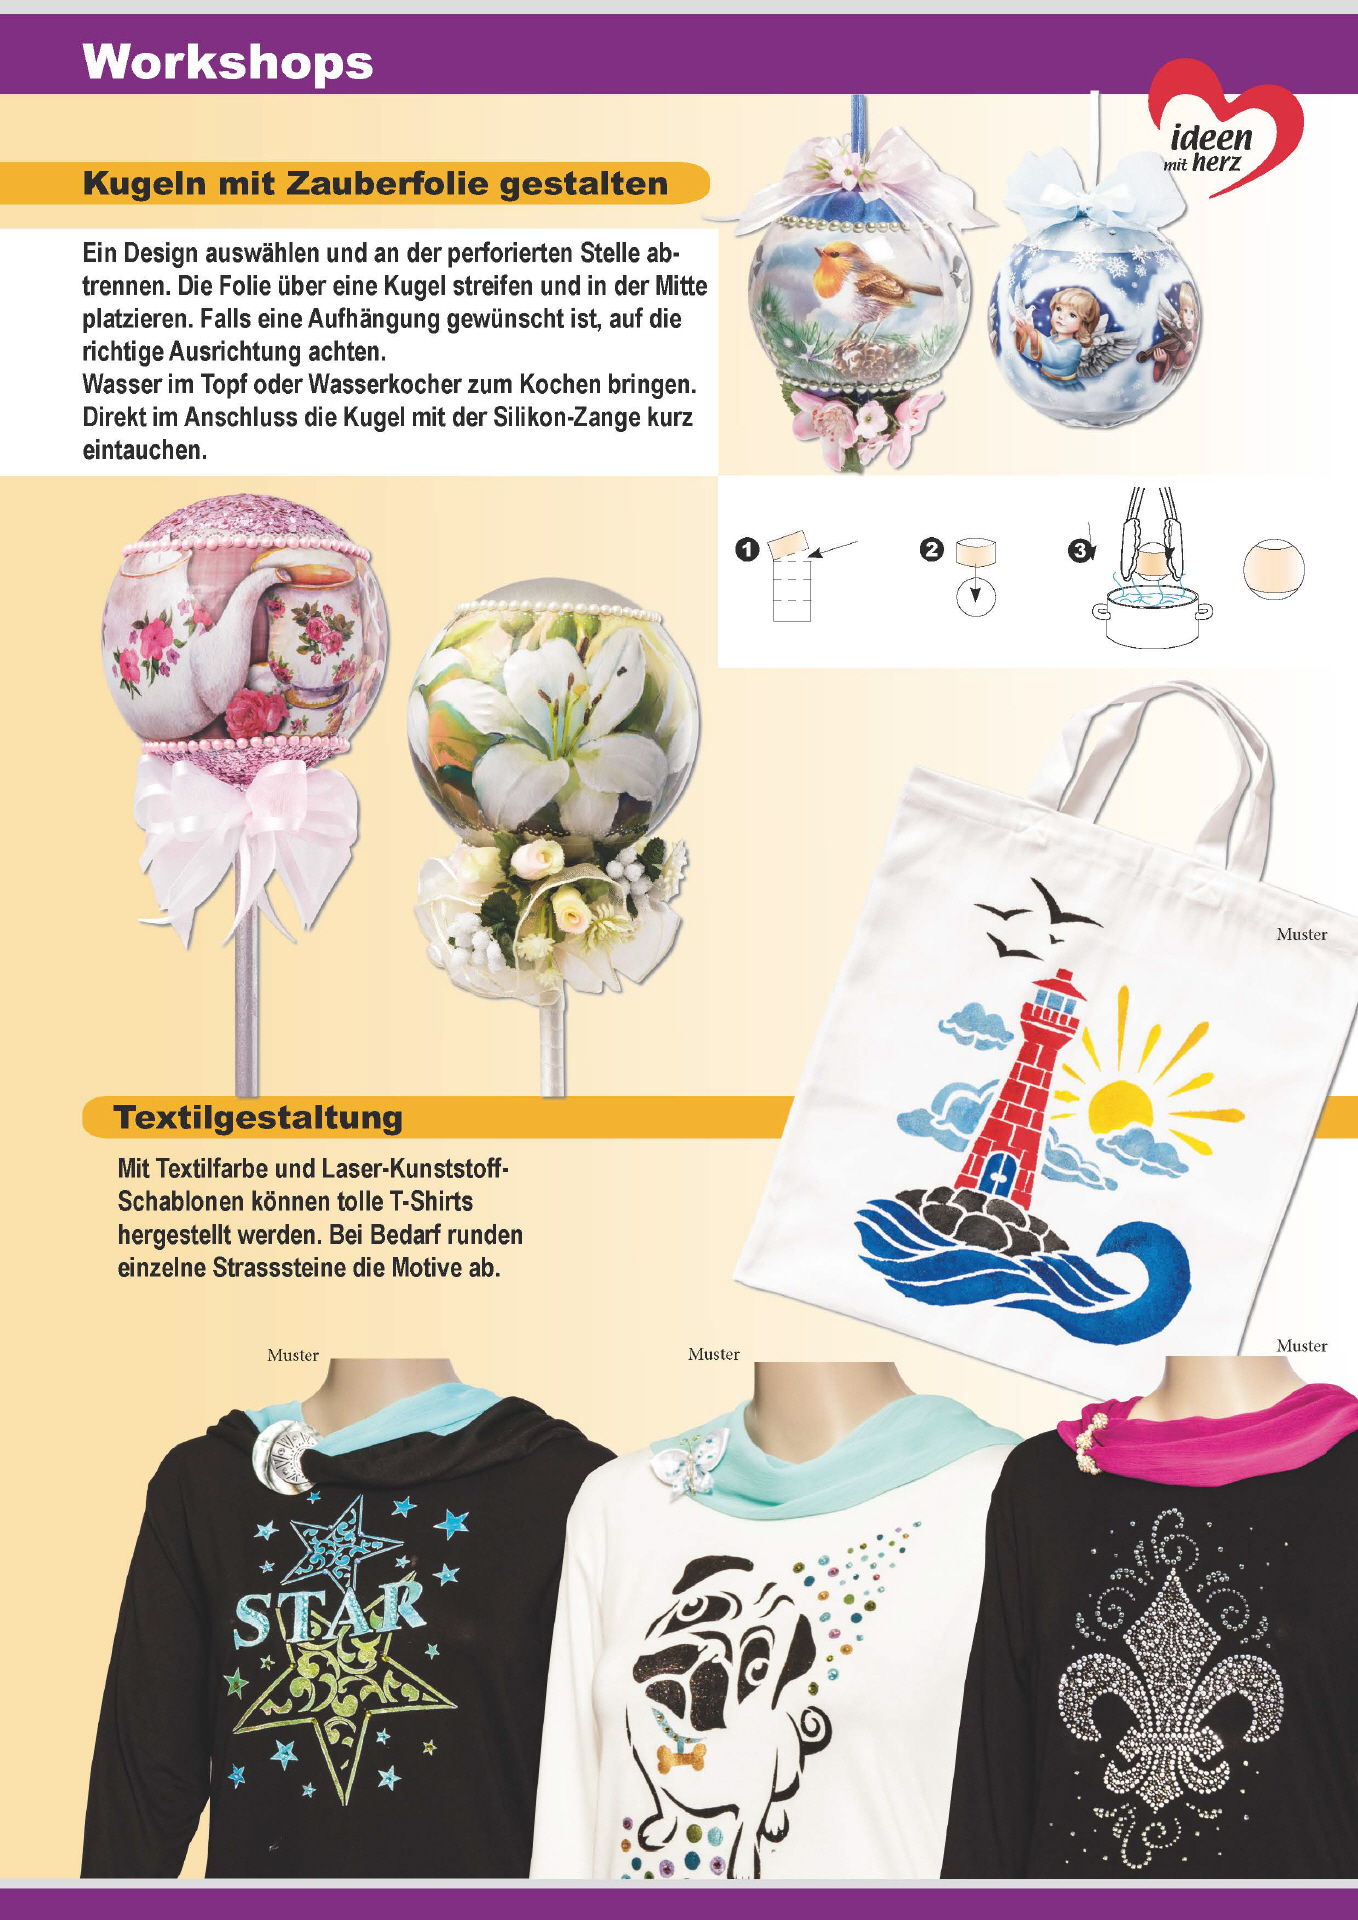 Textilgestaltung